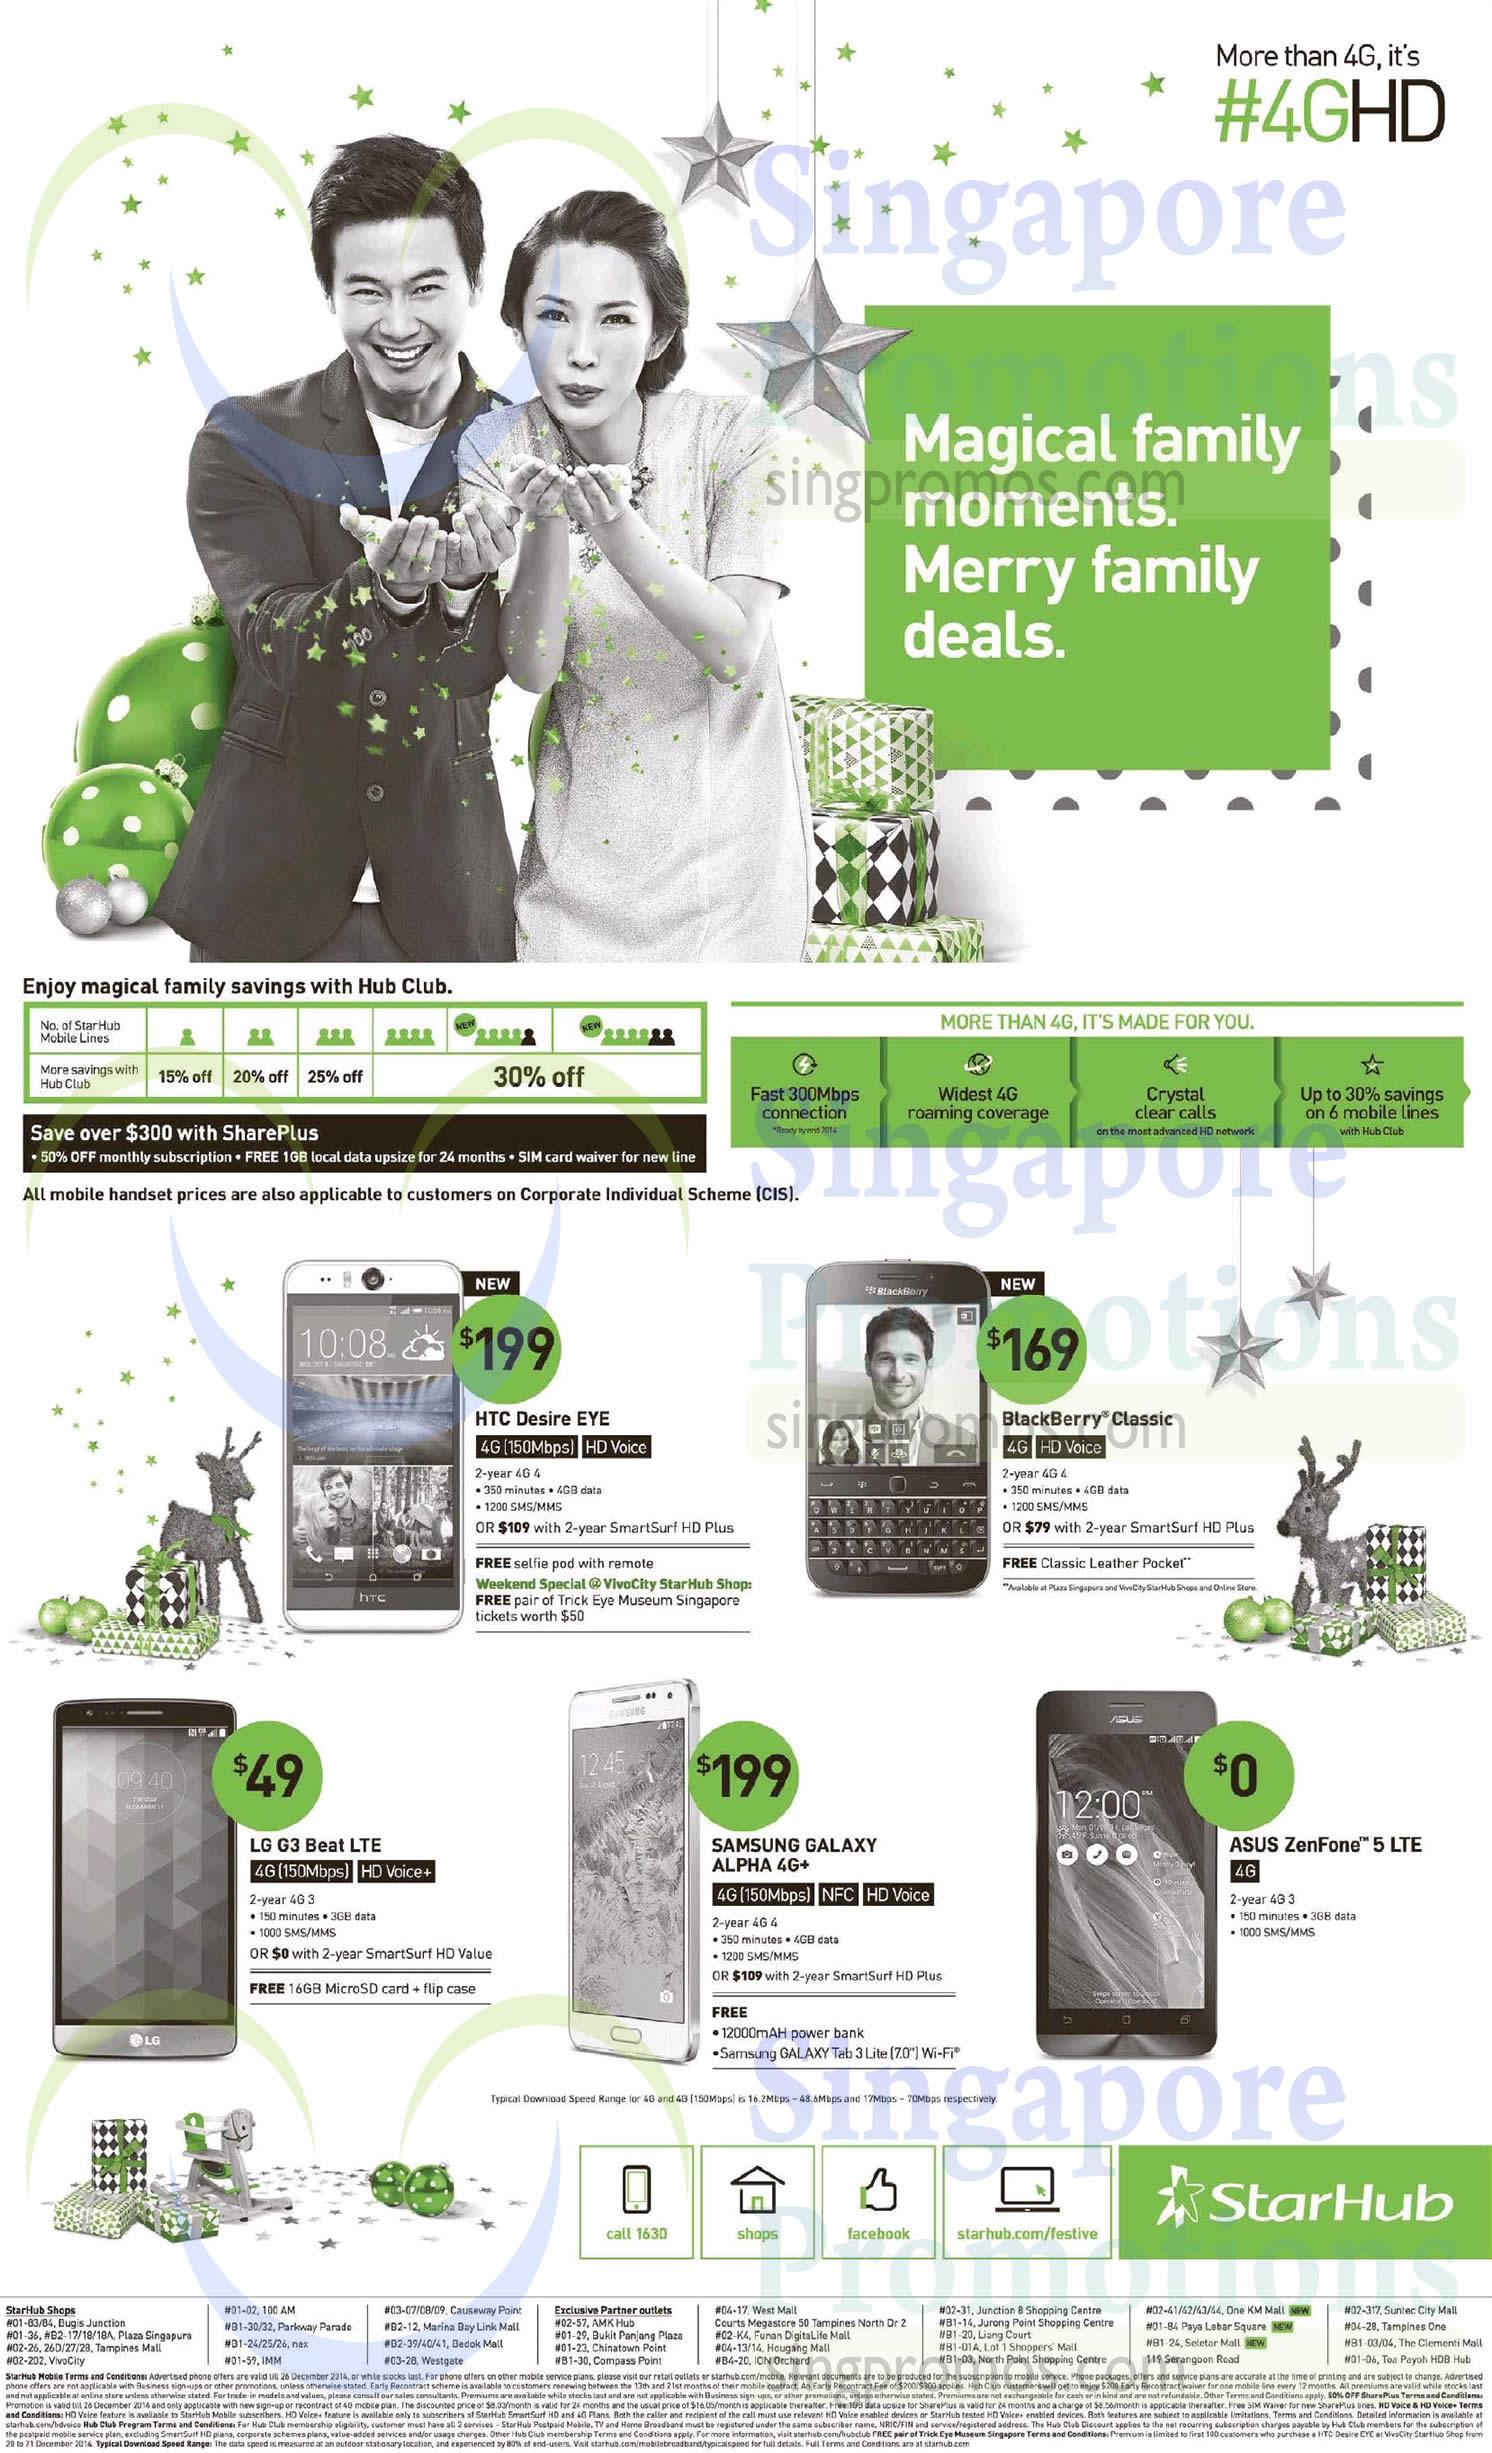 HTC Desire Eye, Blackberry Classic, LG G3 Beat, Samsung Galaxy Alpha, Asus Zenfone 5